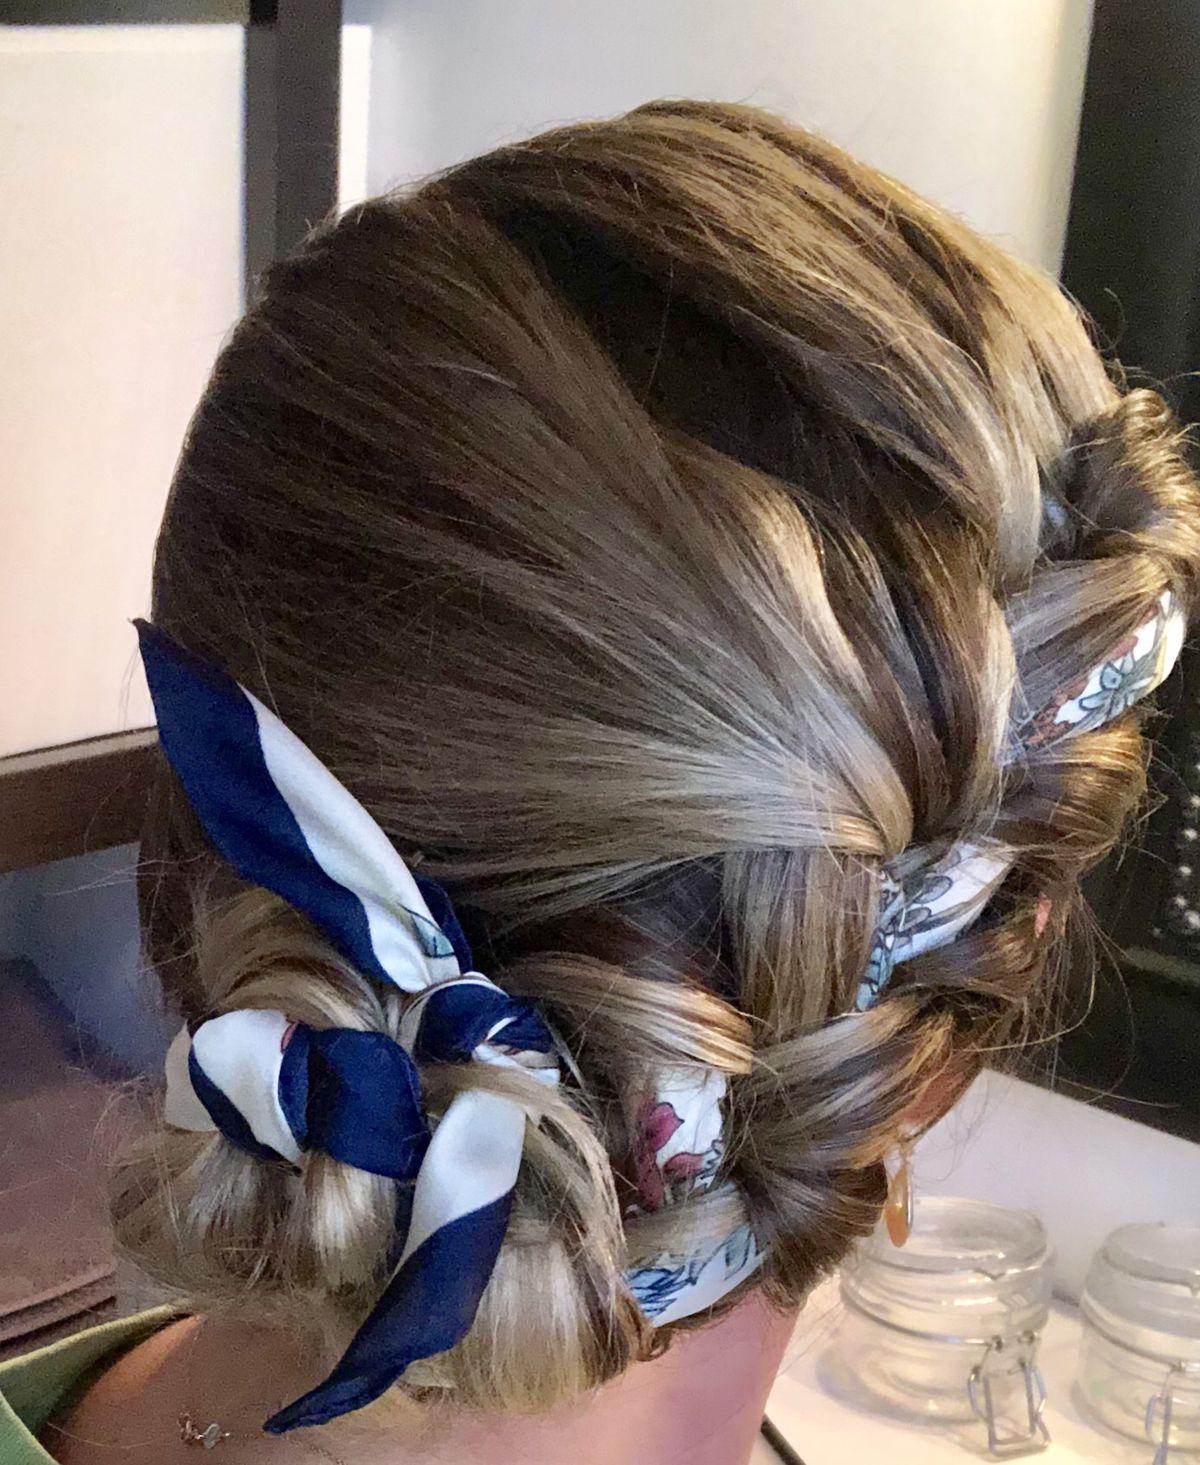 Hair Inspiration 2019-04-18 16:08:54